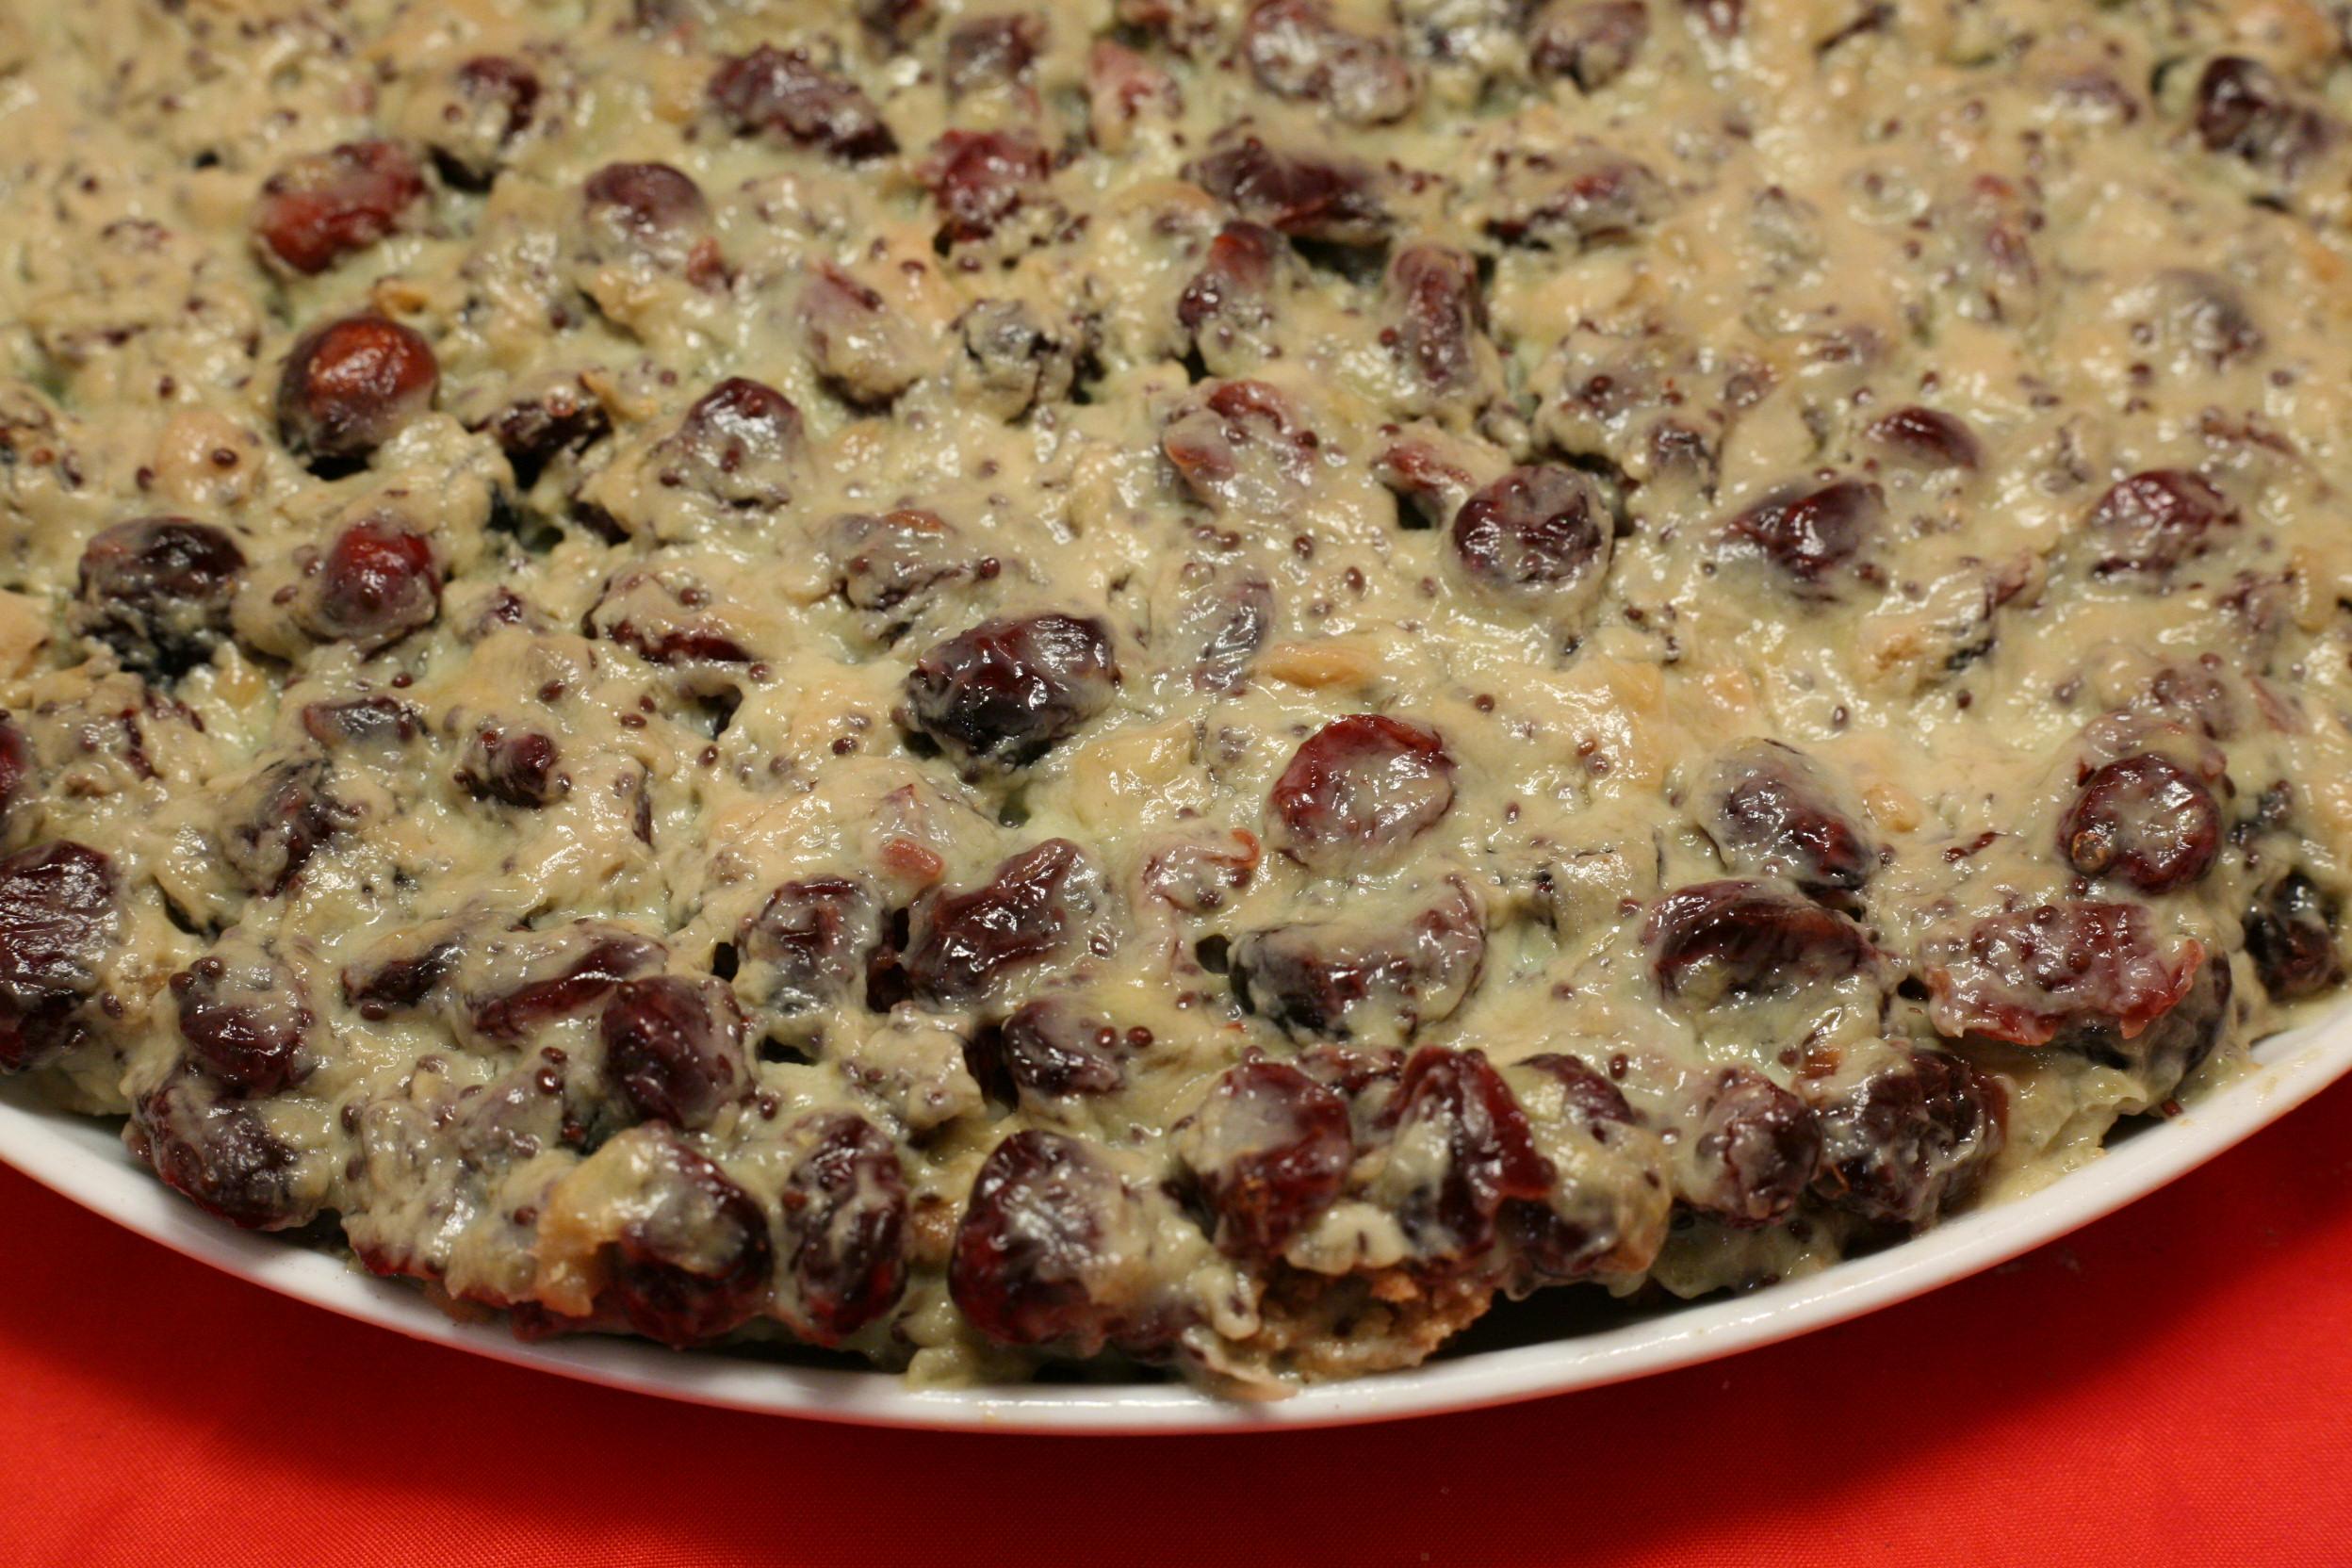 Kiwi-Joghurt-Torte mit Cranberries